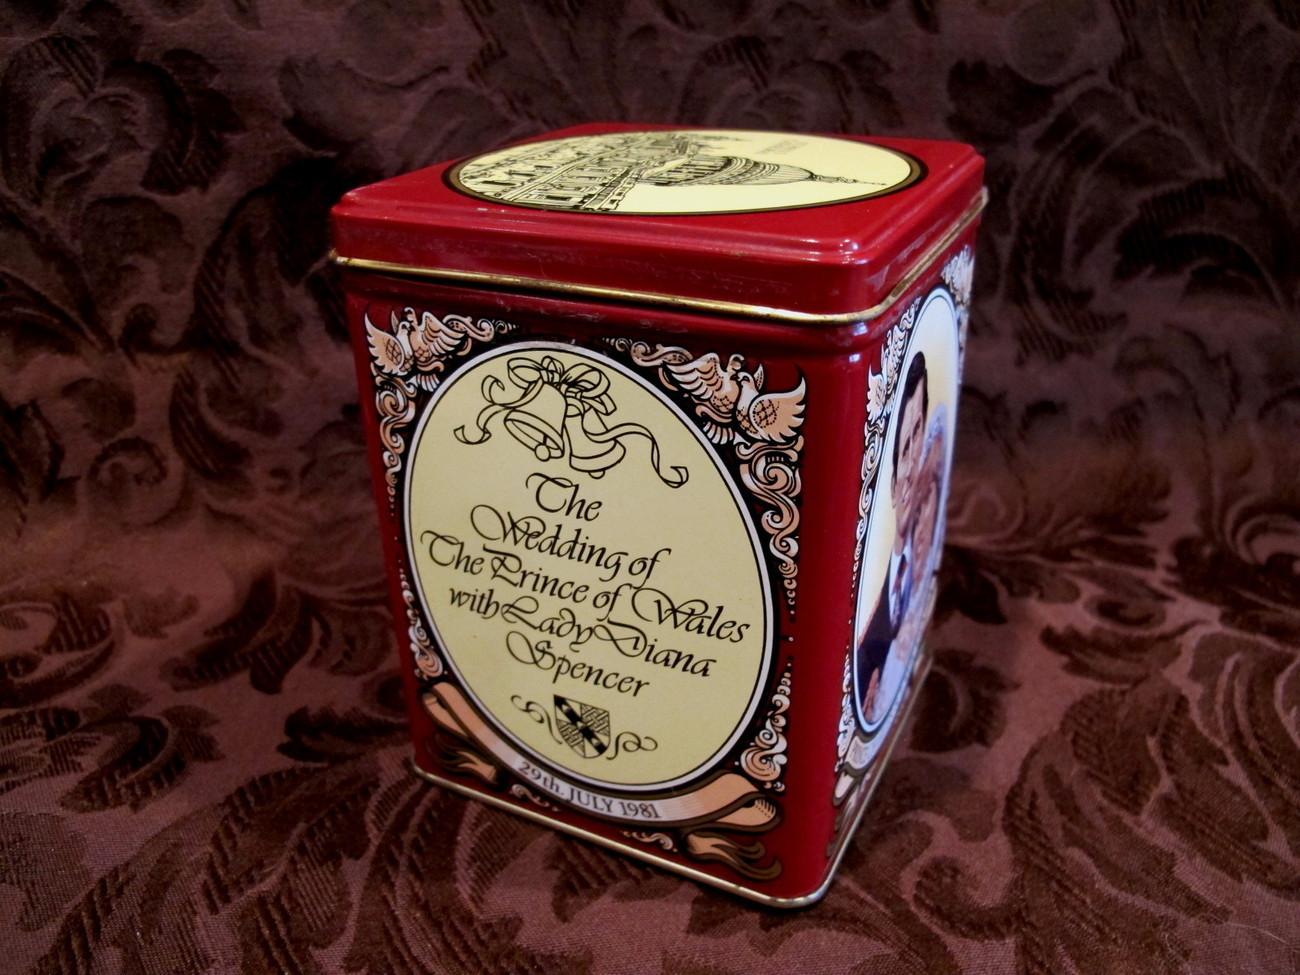 Prince Charles Lady Diana Royal Wedding Tea Tin Can Vintage Souvenir Collector